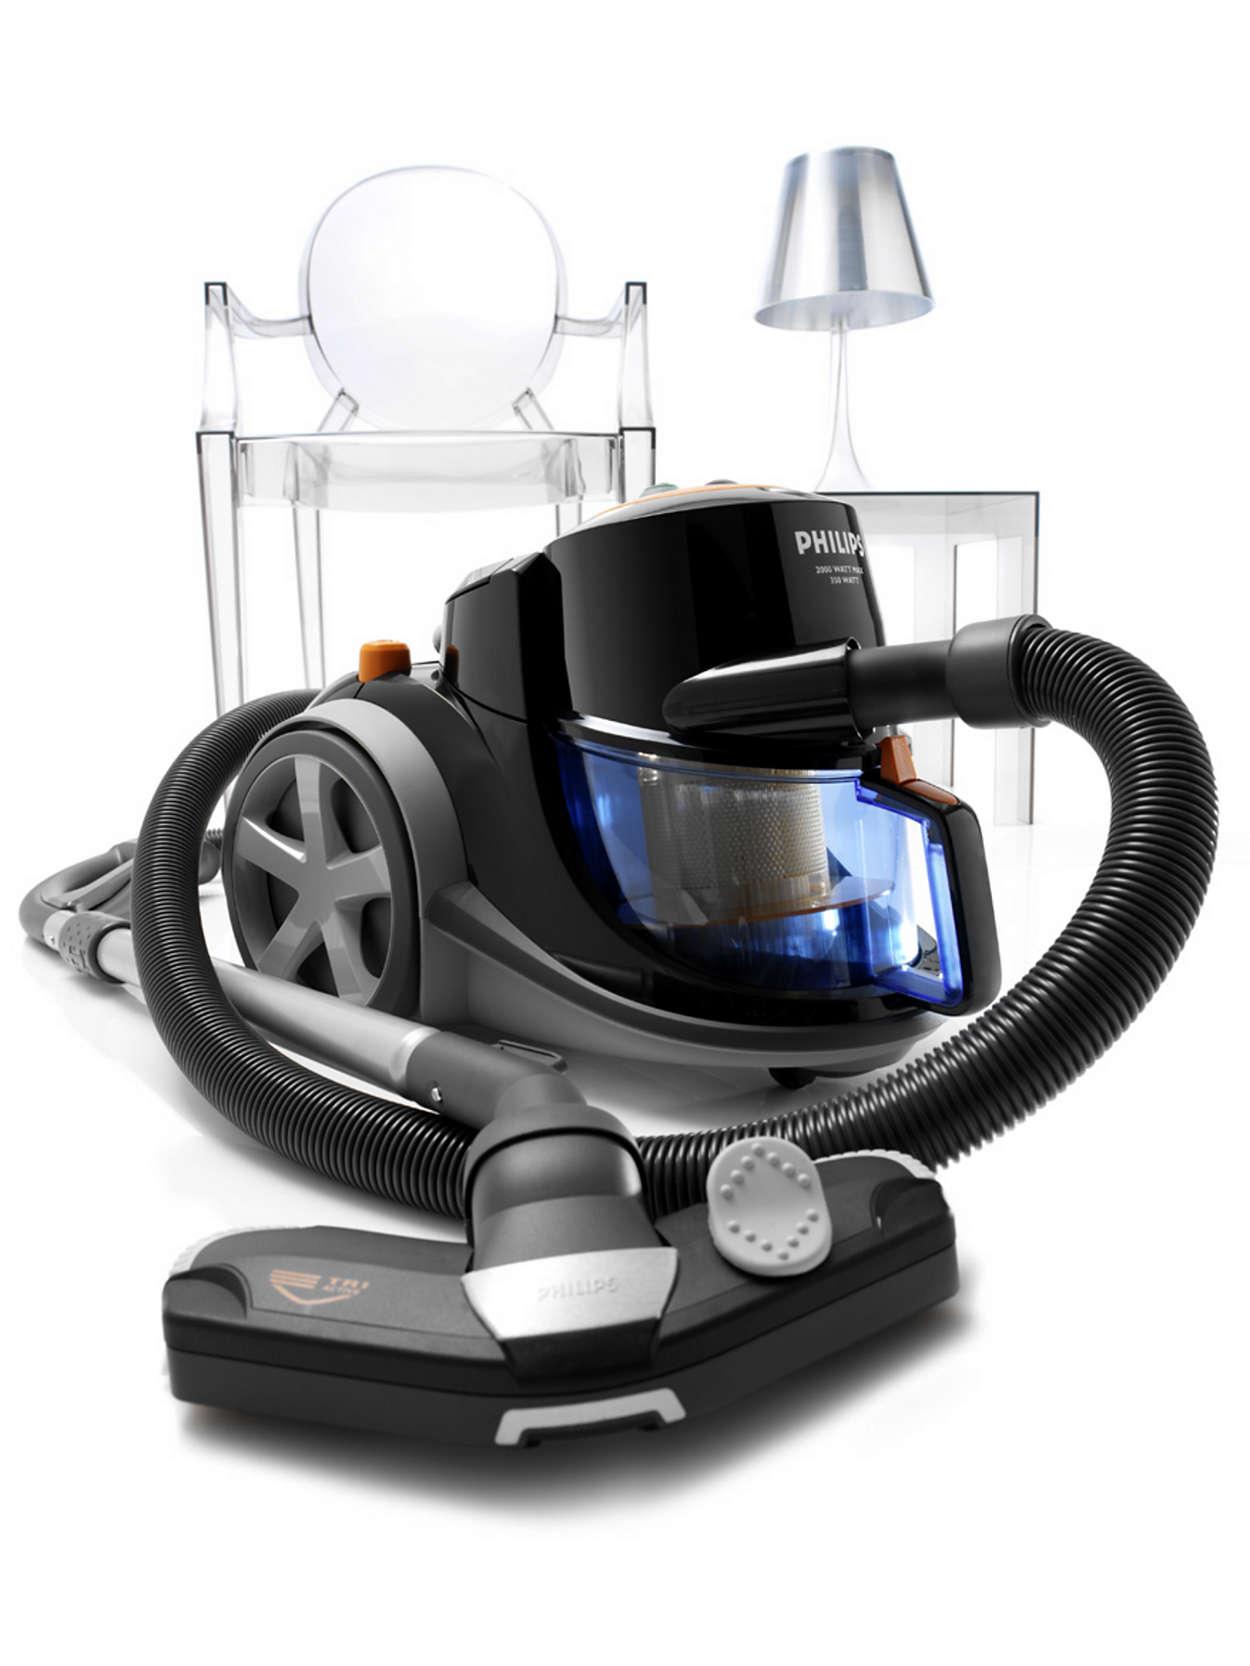 marathon aspirateur sans sac fc9216 04 philips. Black Bedroom Furniture Sets. Home Design Ideas